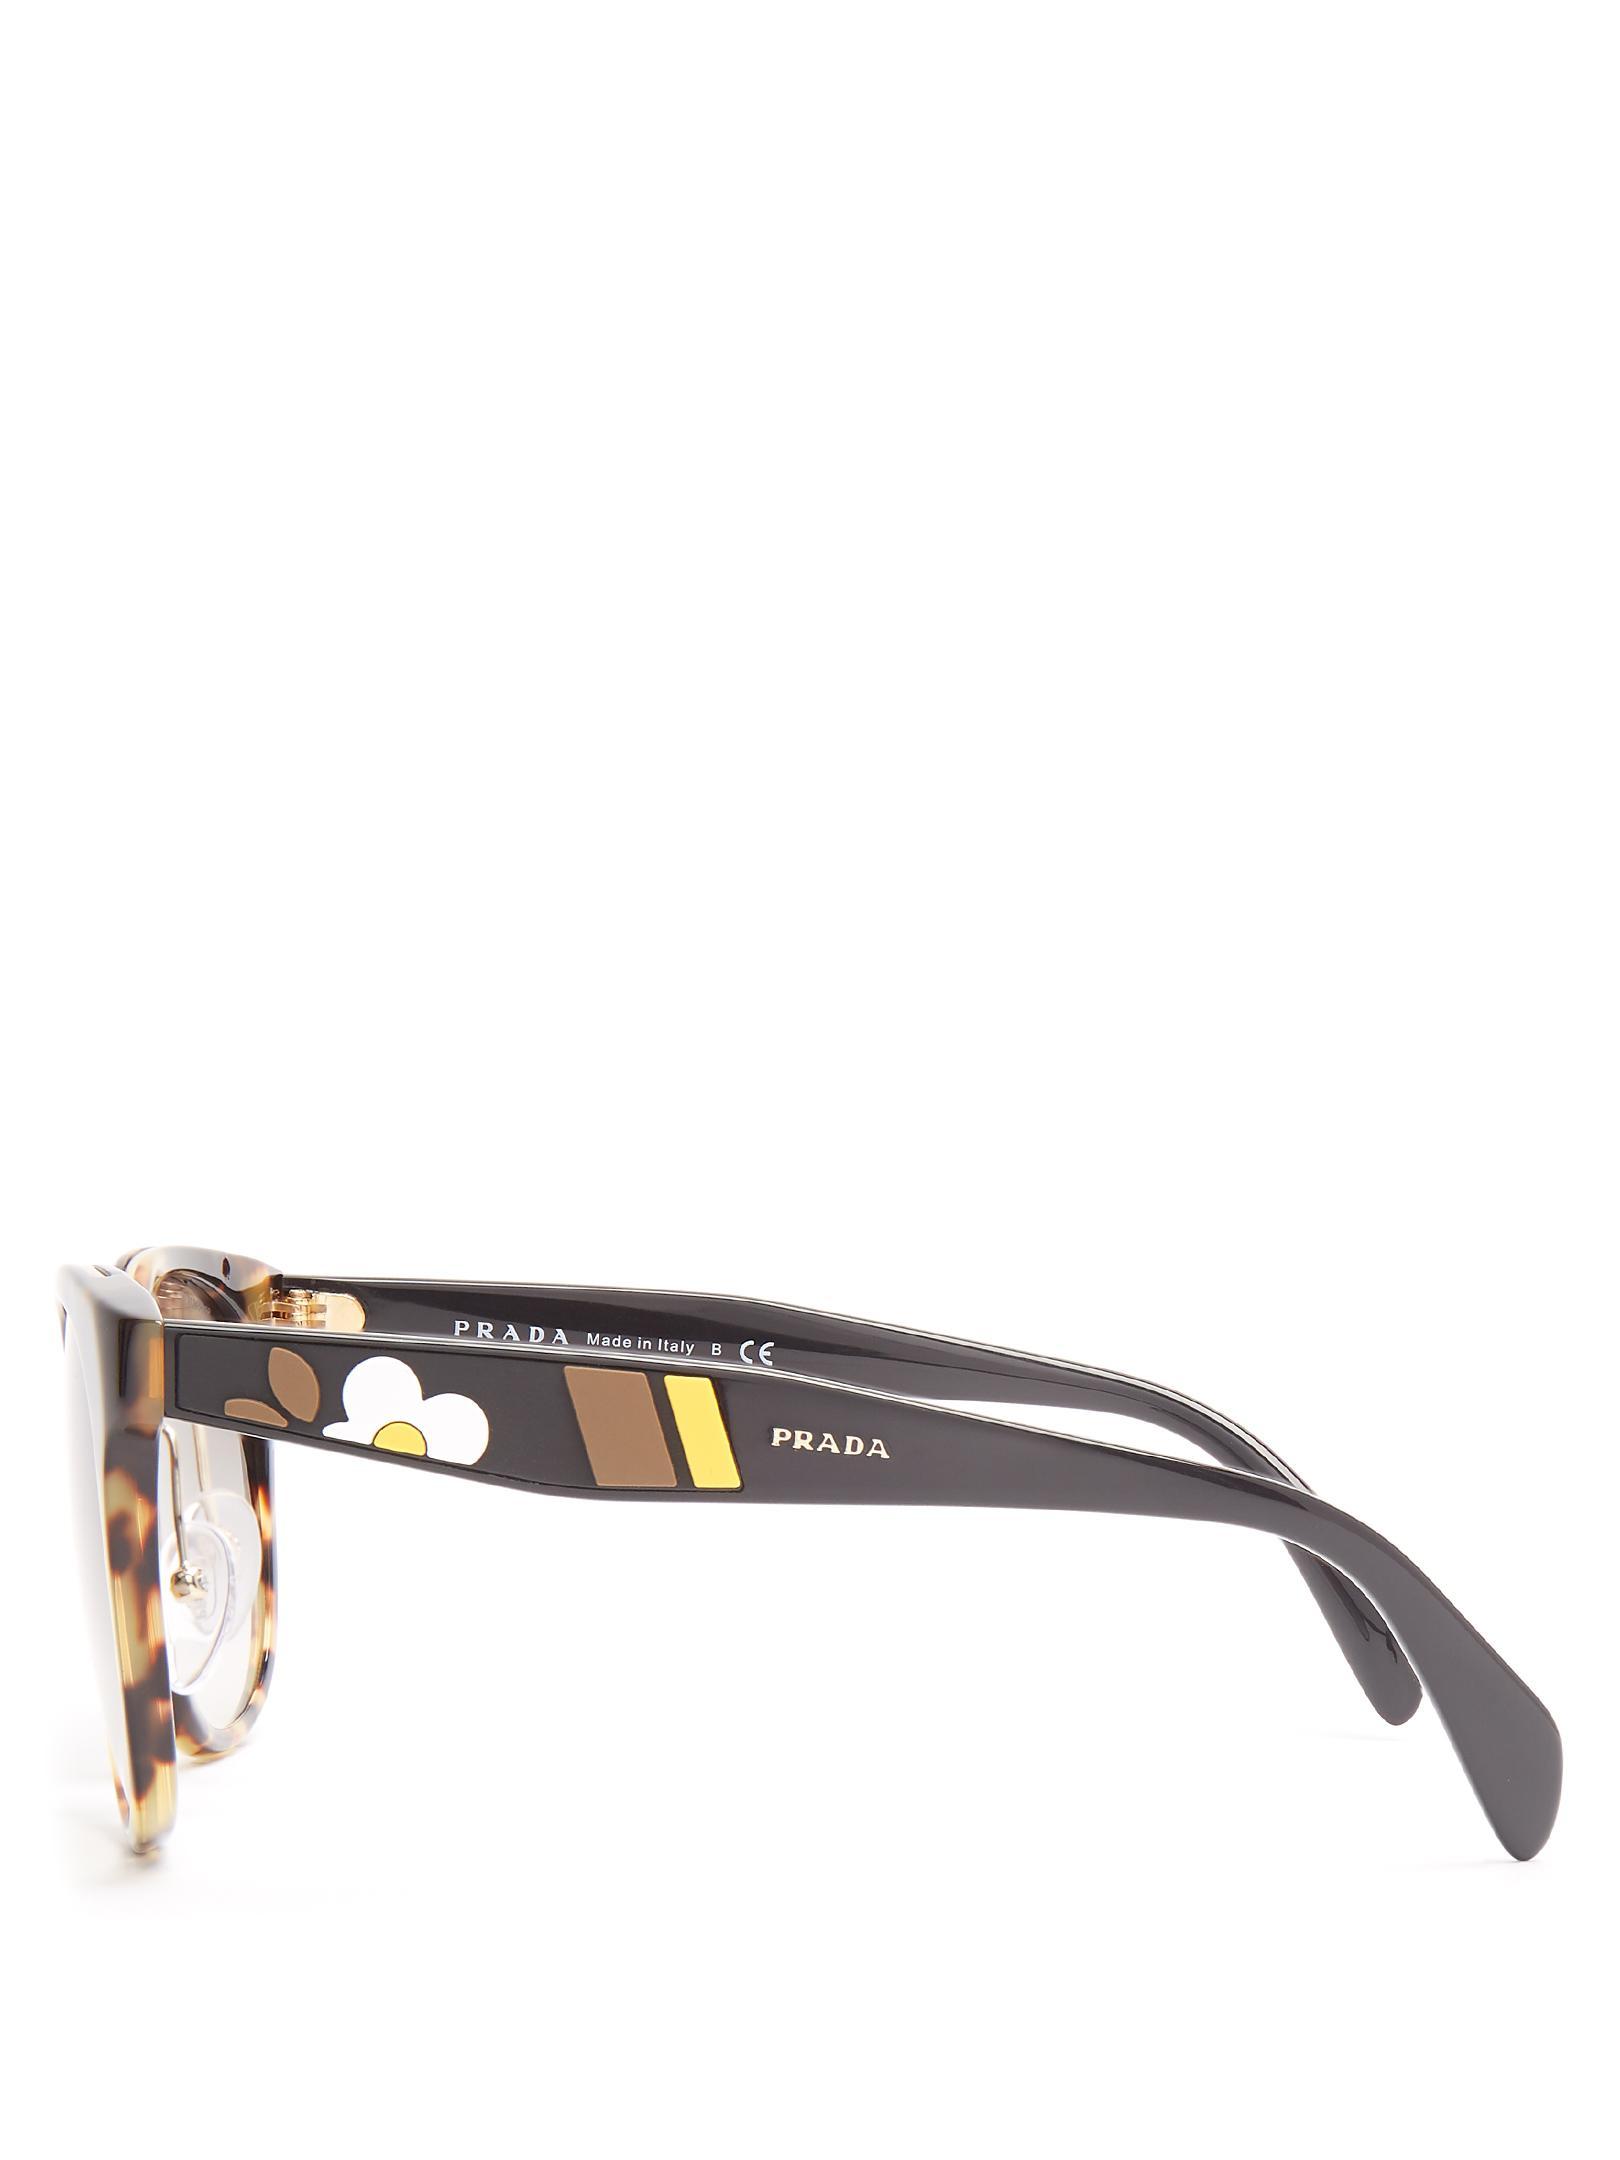 95e840f1e8d1 ... australia lyst prada round frame floral embellished acetate sunglasses  dd3e6 7ab05